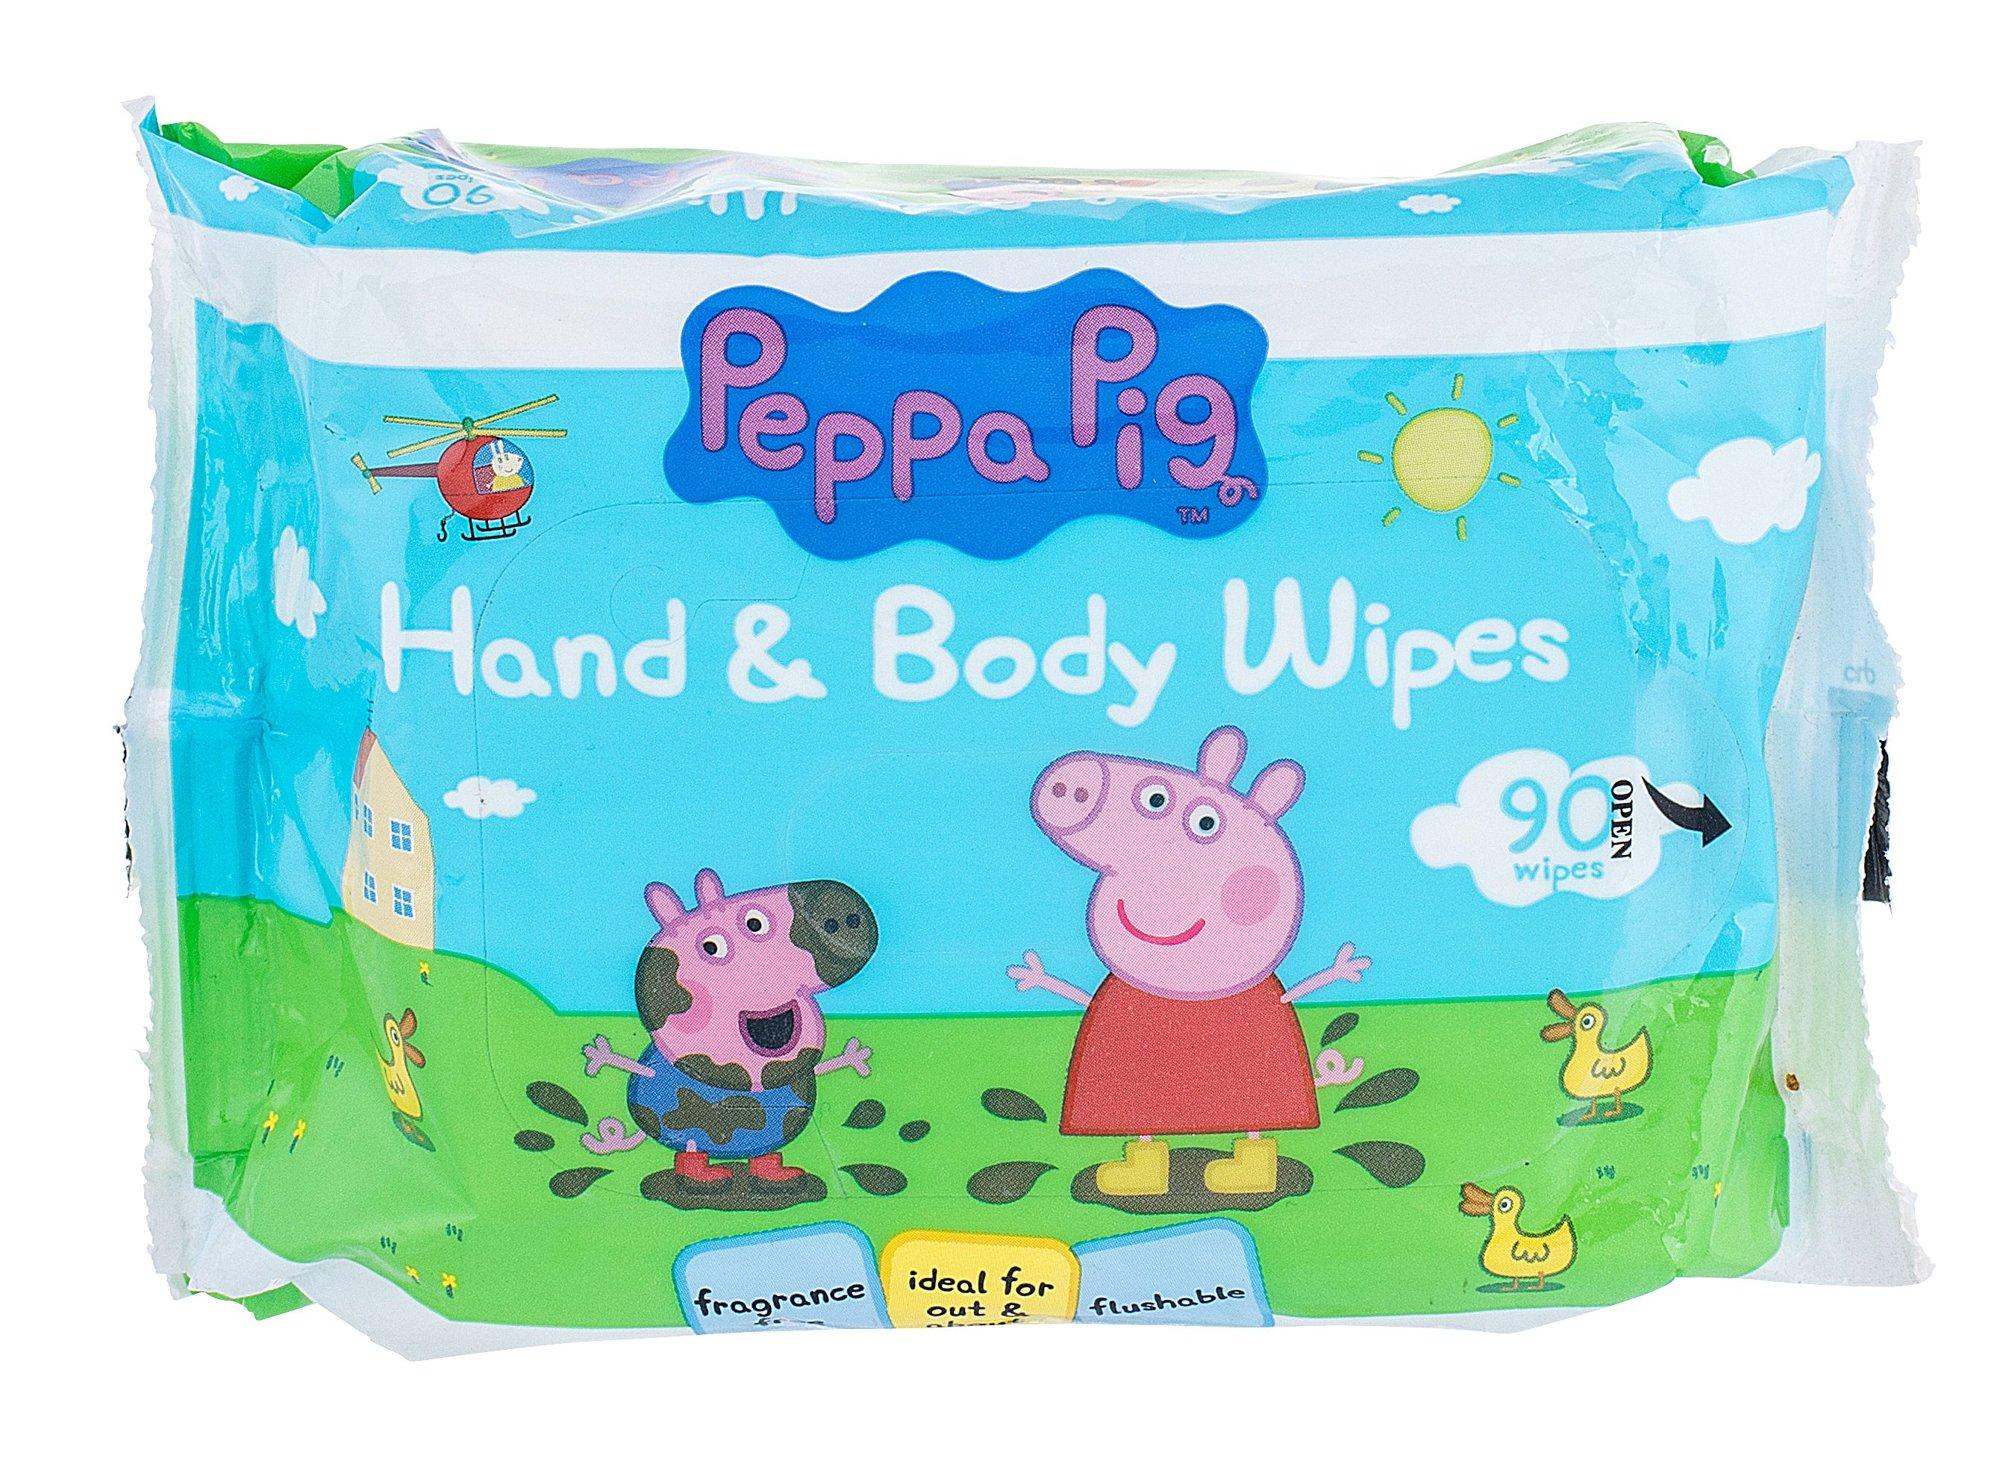 Peppa Pig Hand & Body Wipes Cosmetic 90ks